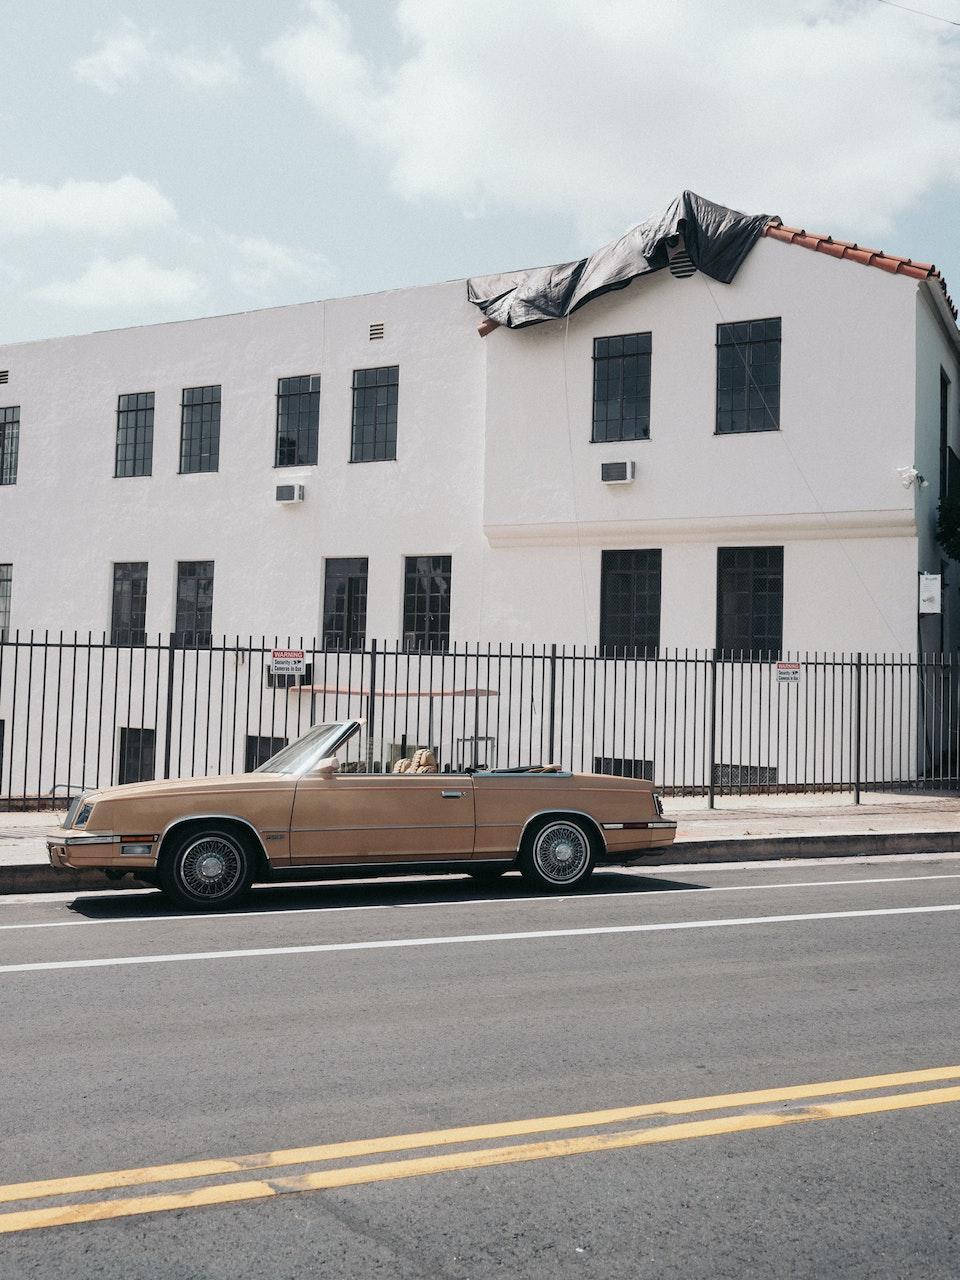 Greg Ephraim: Cinematographer: 'Los Angeles Drive Byes' - IMG_0038